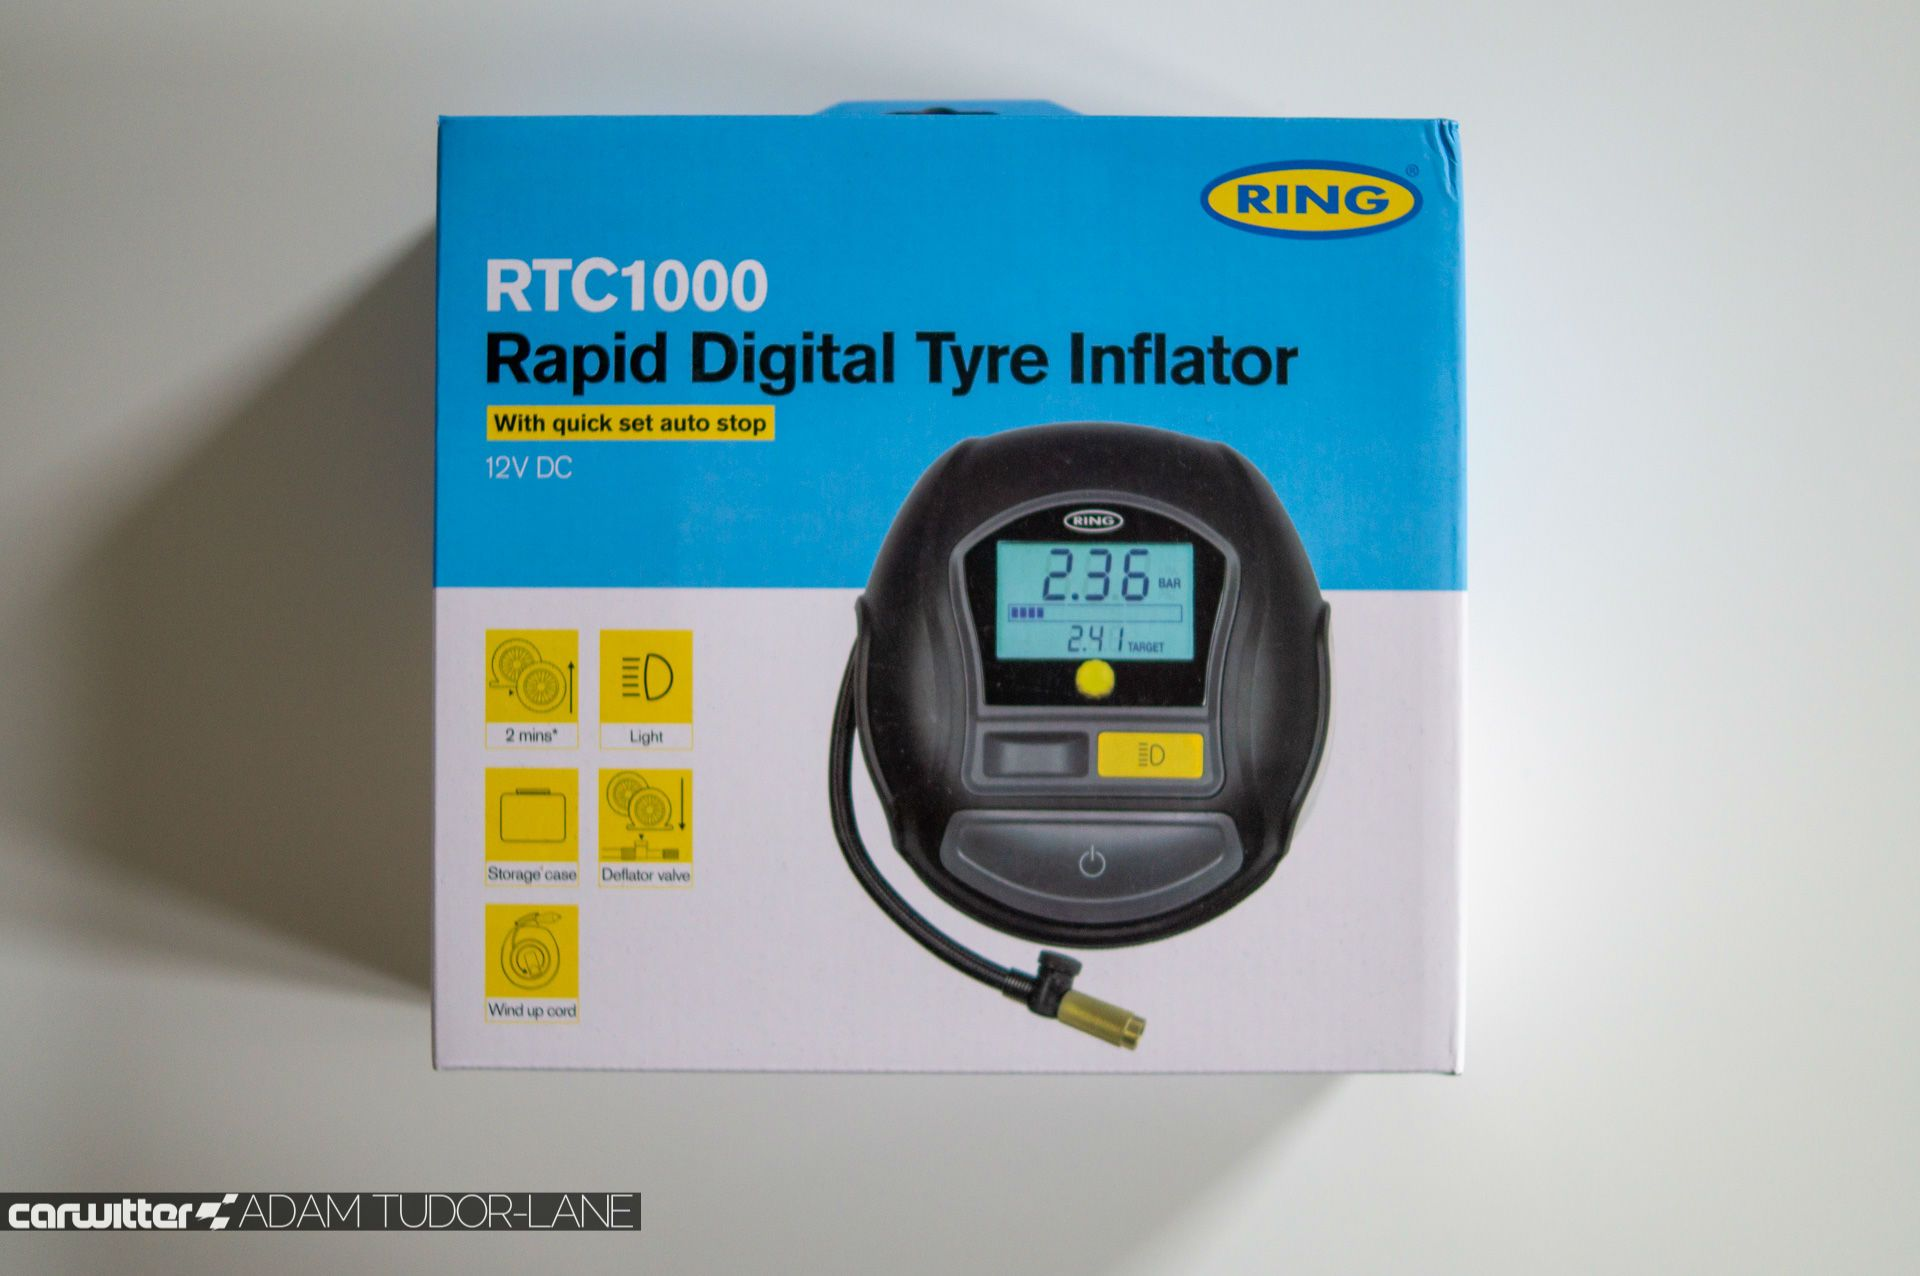 Win a Ring RTC1000 Rapid Digital Tyre